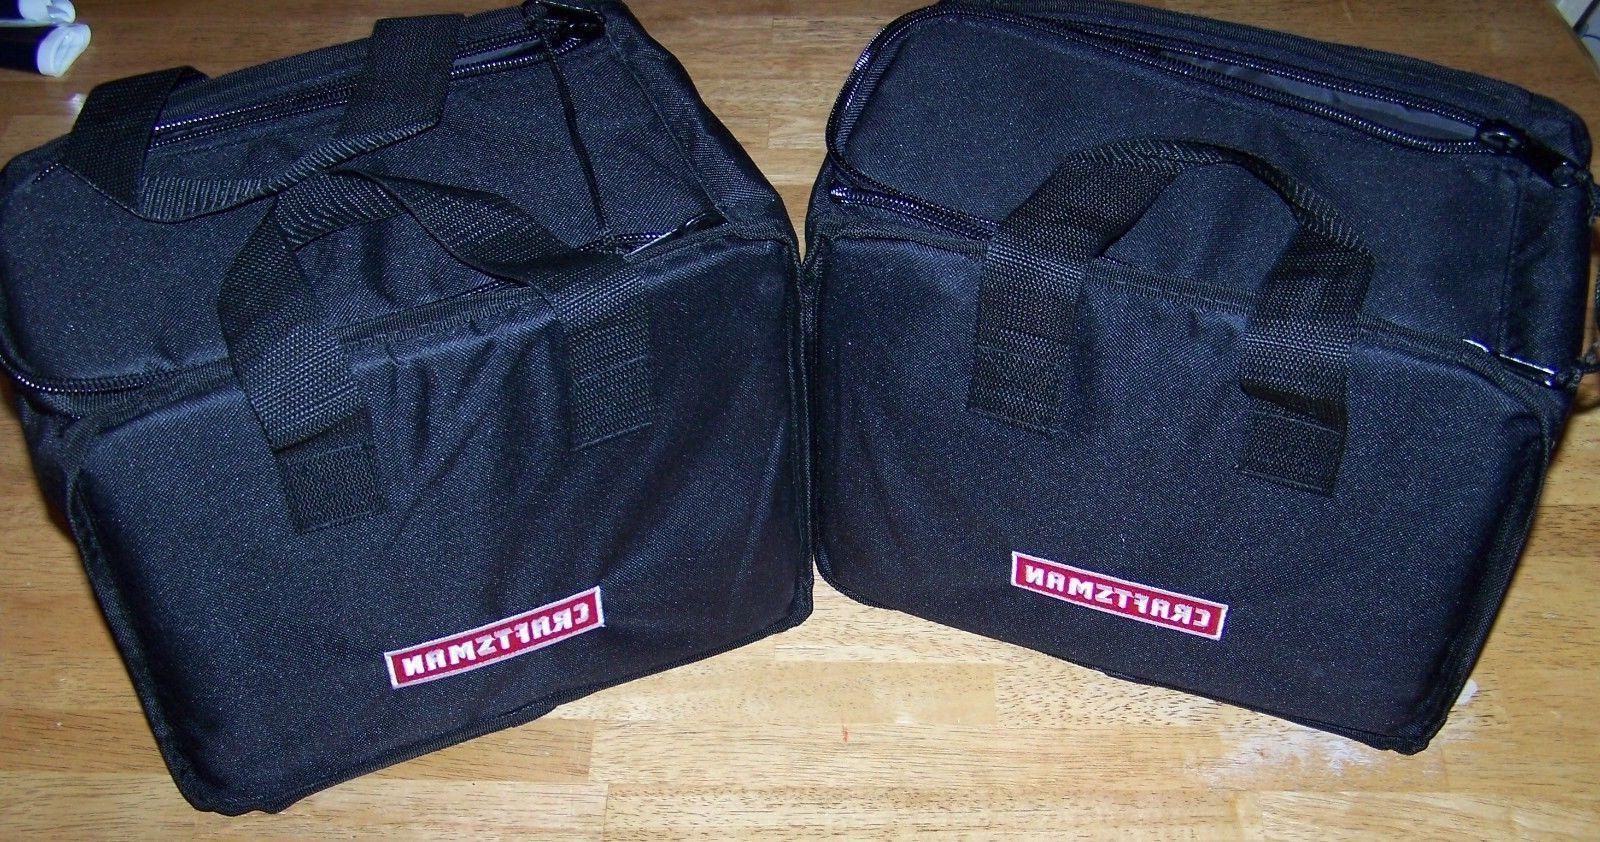 Lot of 2 Craftsman 19.2v C3 Cordless Drill Driver Tool Bag 1